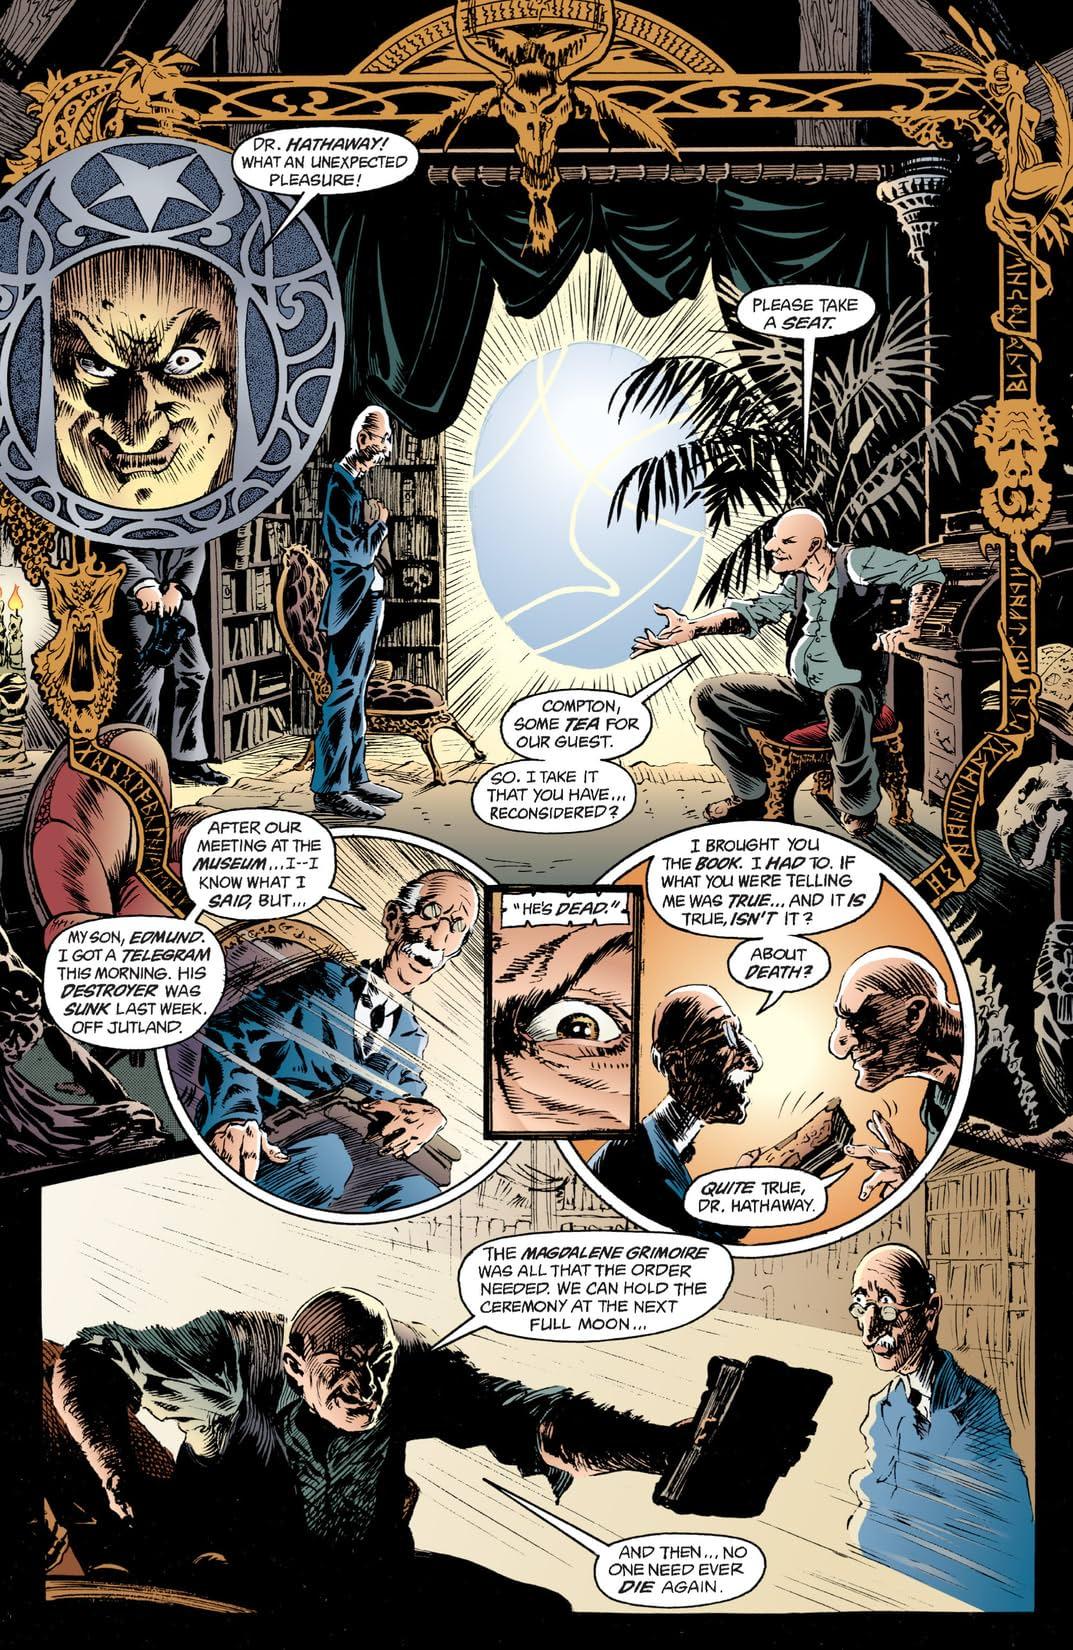 The Sandman Vol. 1: Preludes and Nocturnes